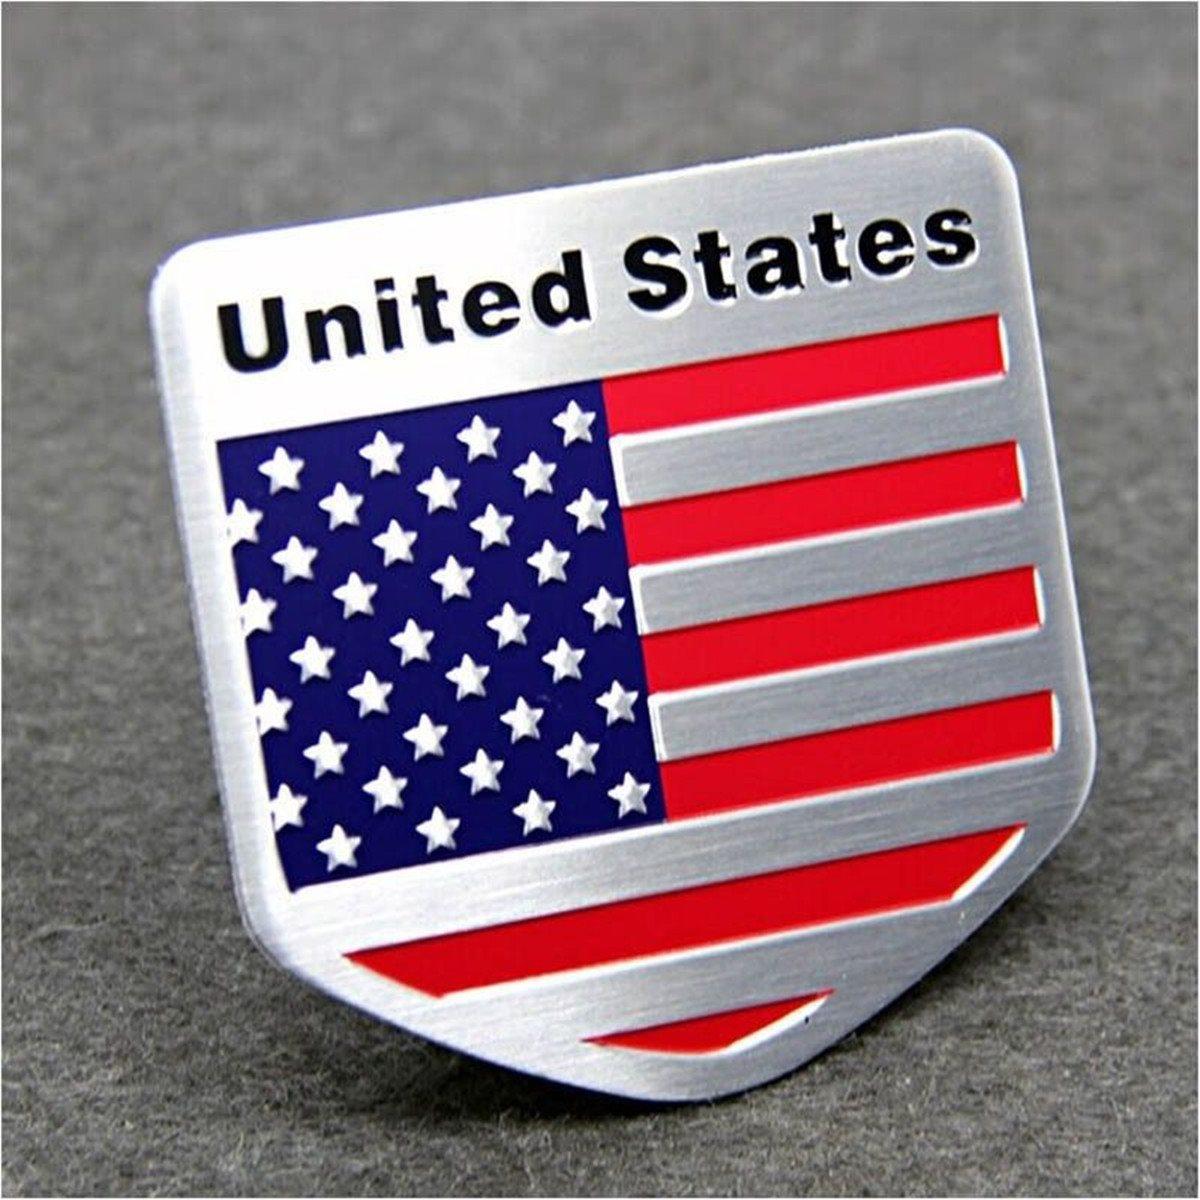 3D Alloy Metal US USA The United States American Flag Sticker Logo Car Auto Sport Badge Chrome Emblem Decals Car Styling 5*5cm